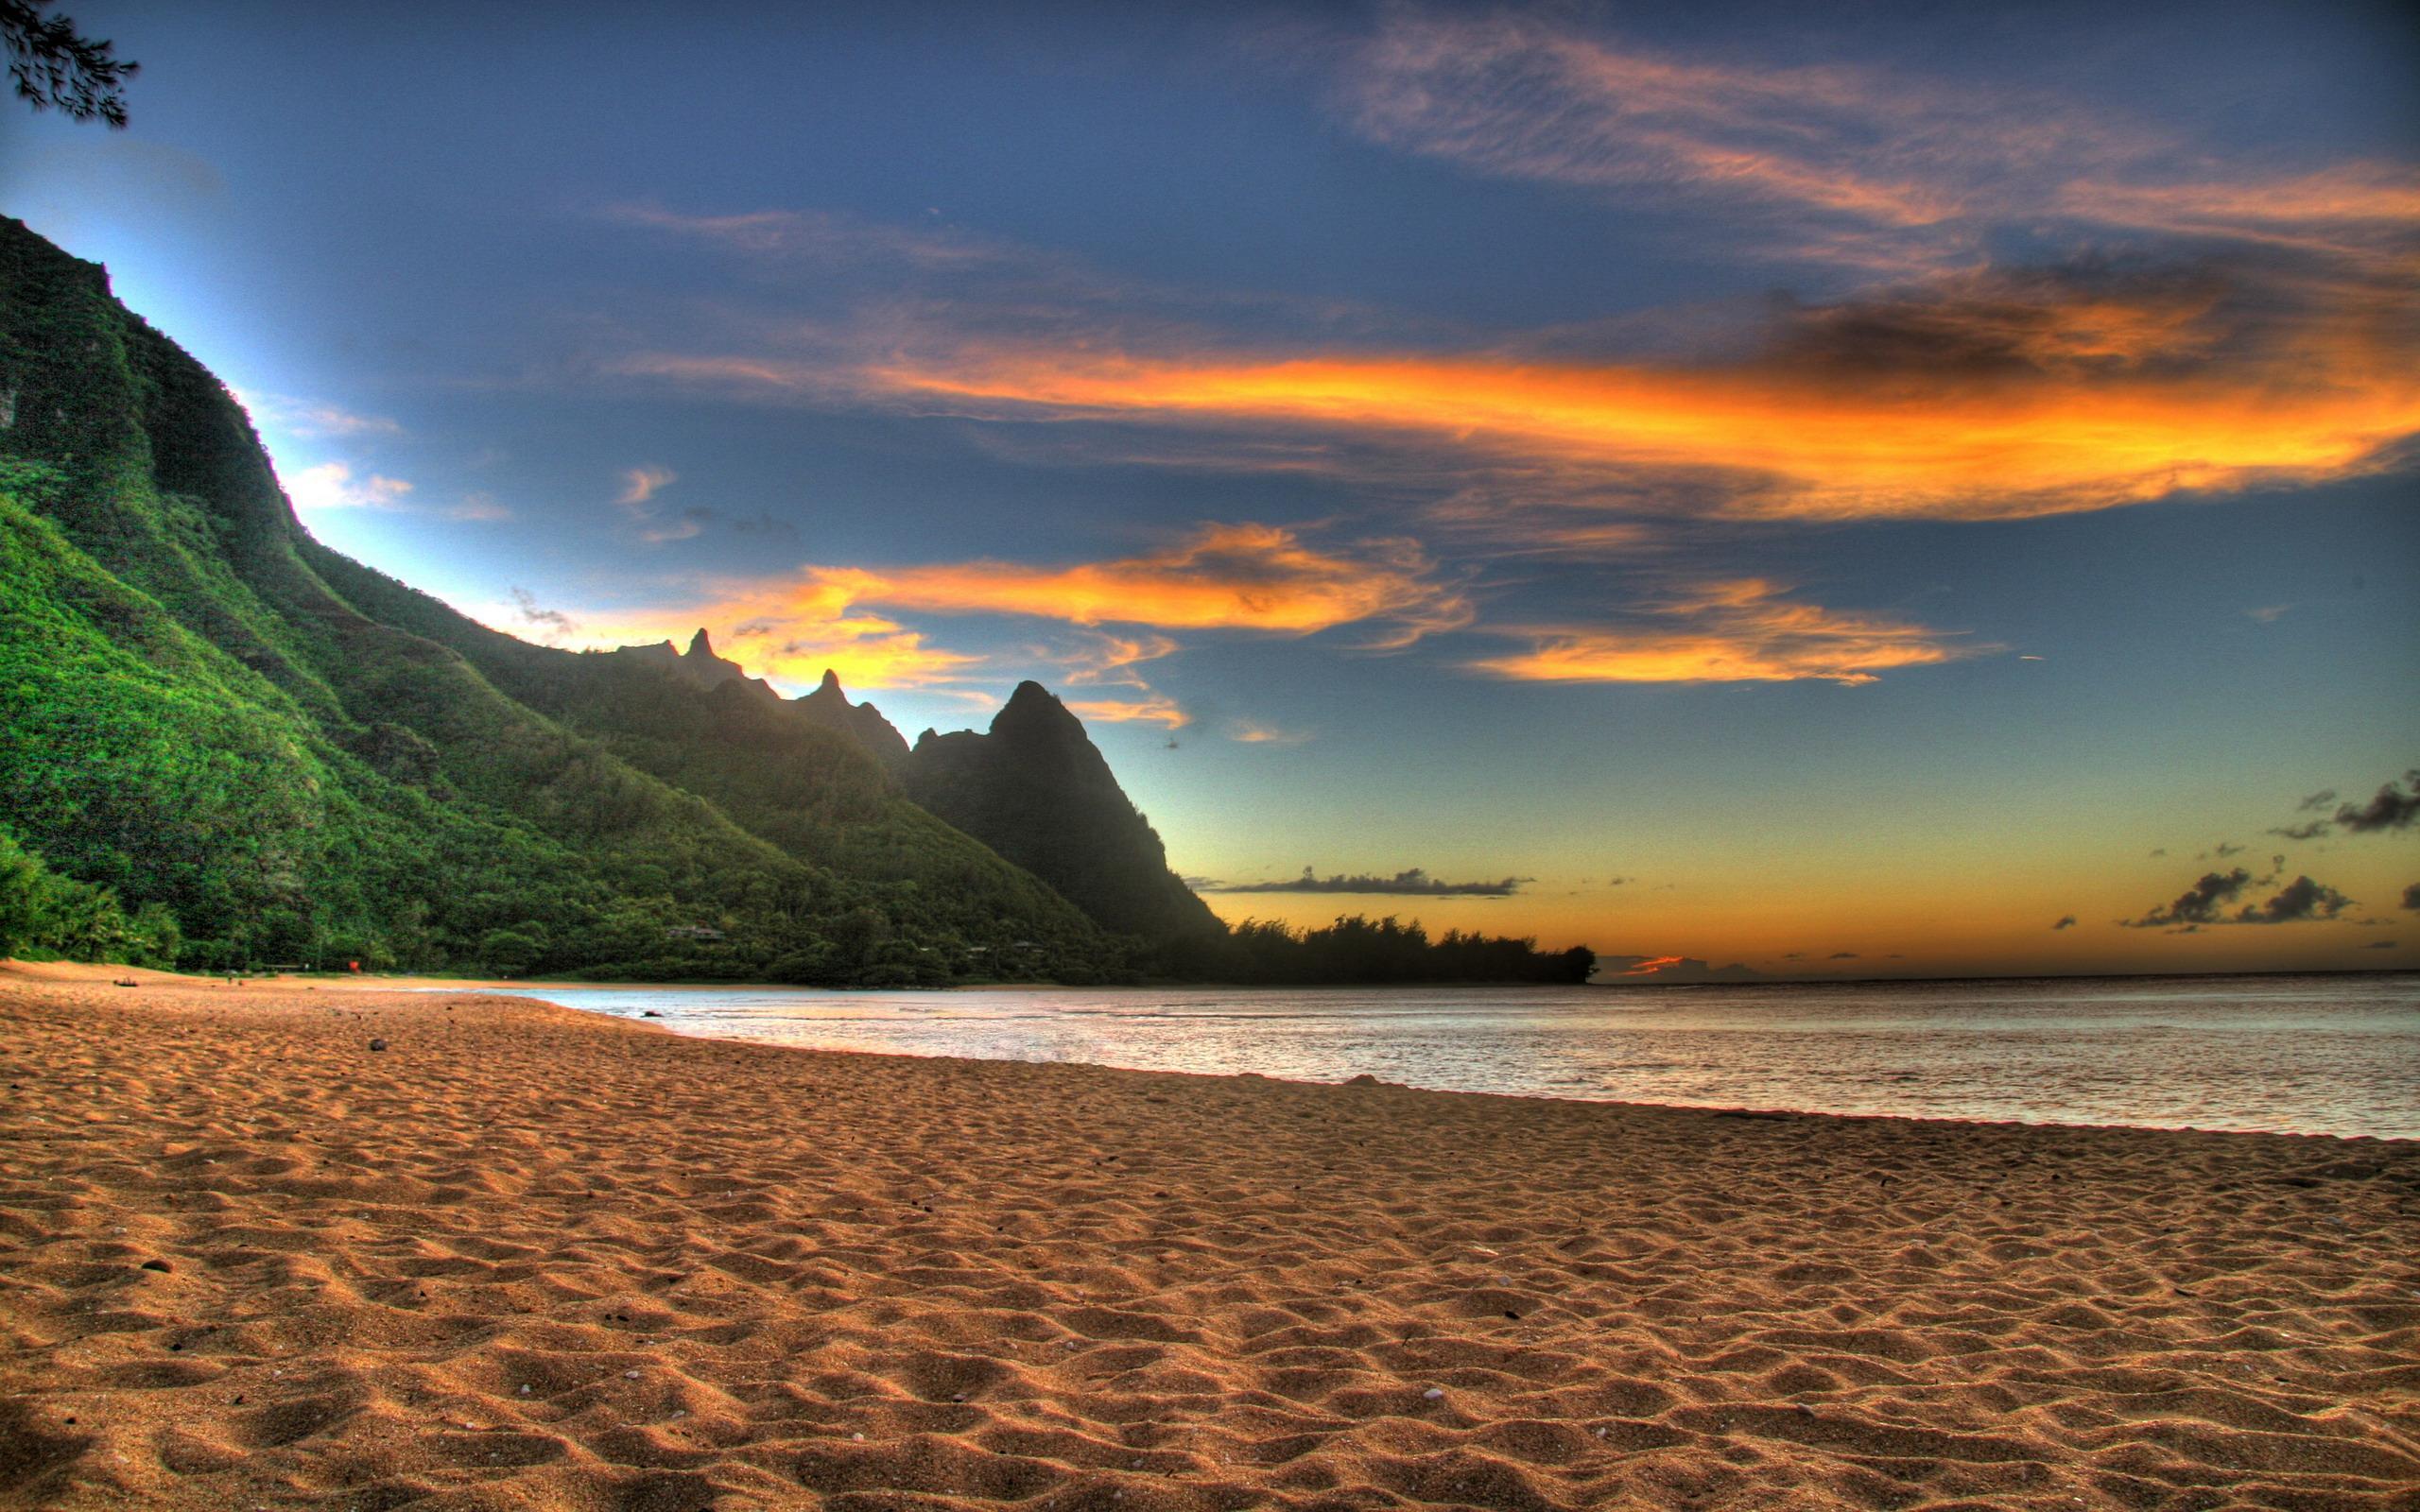 sky at key west florida sandy seashore desktop wallpapers hd